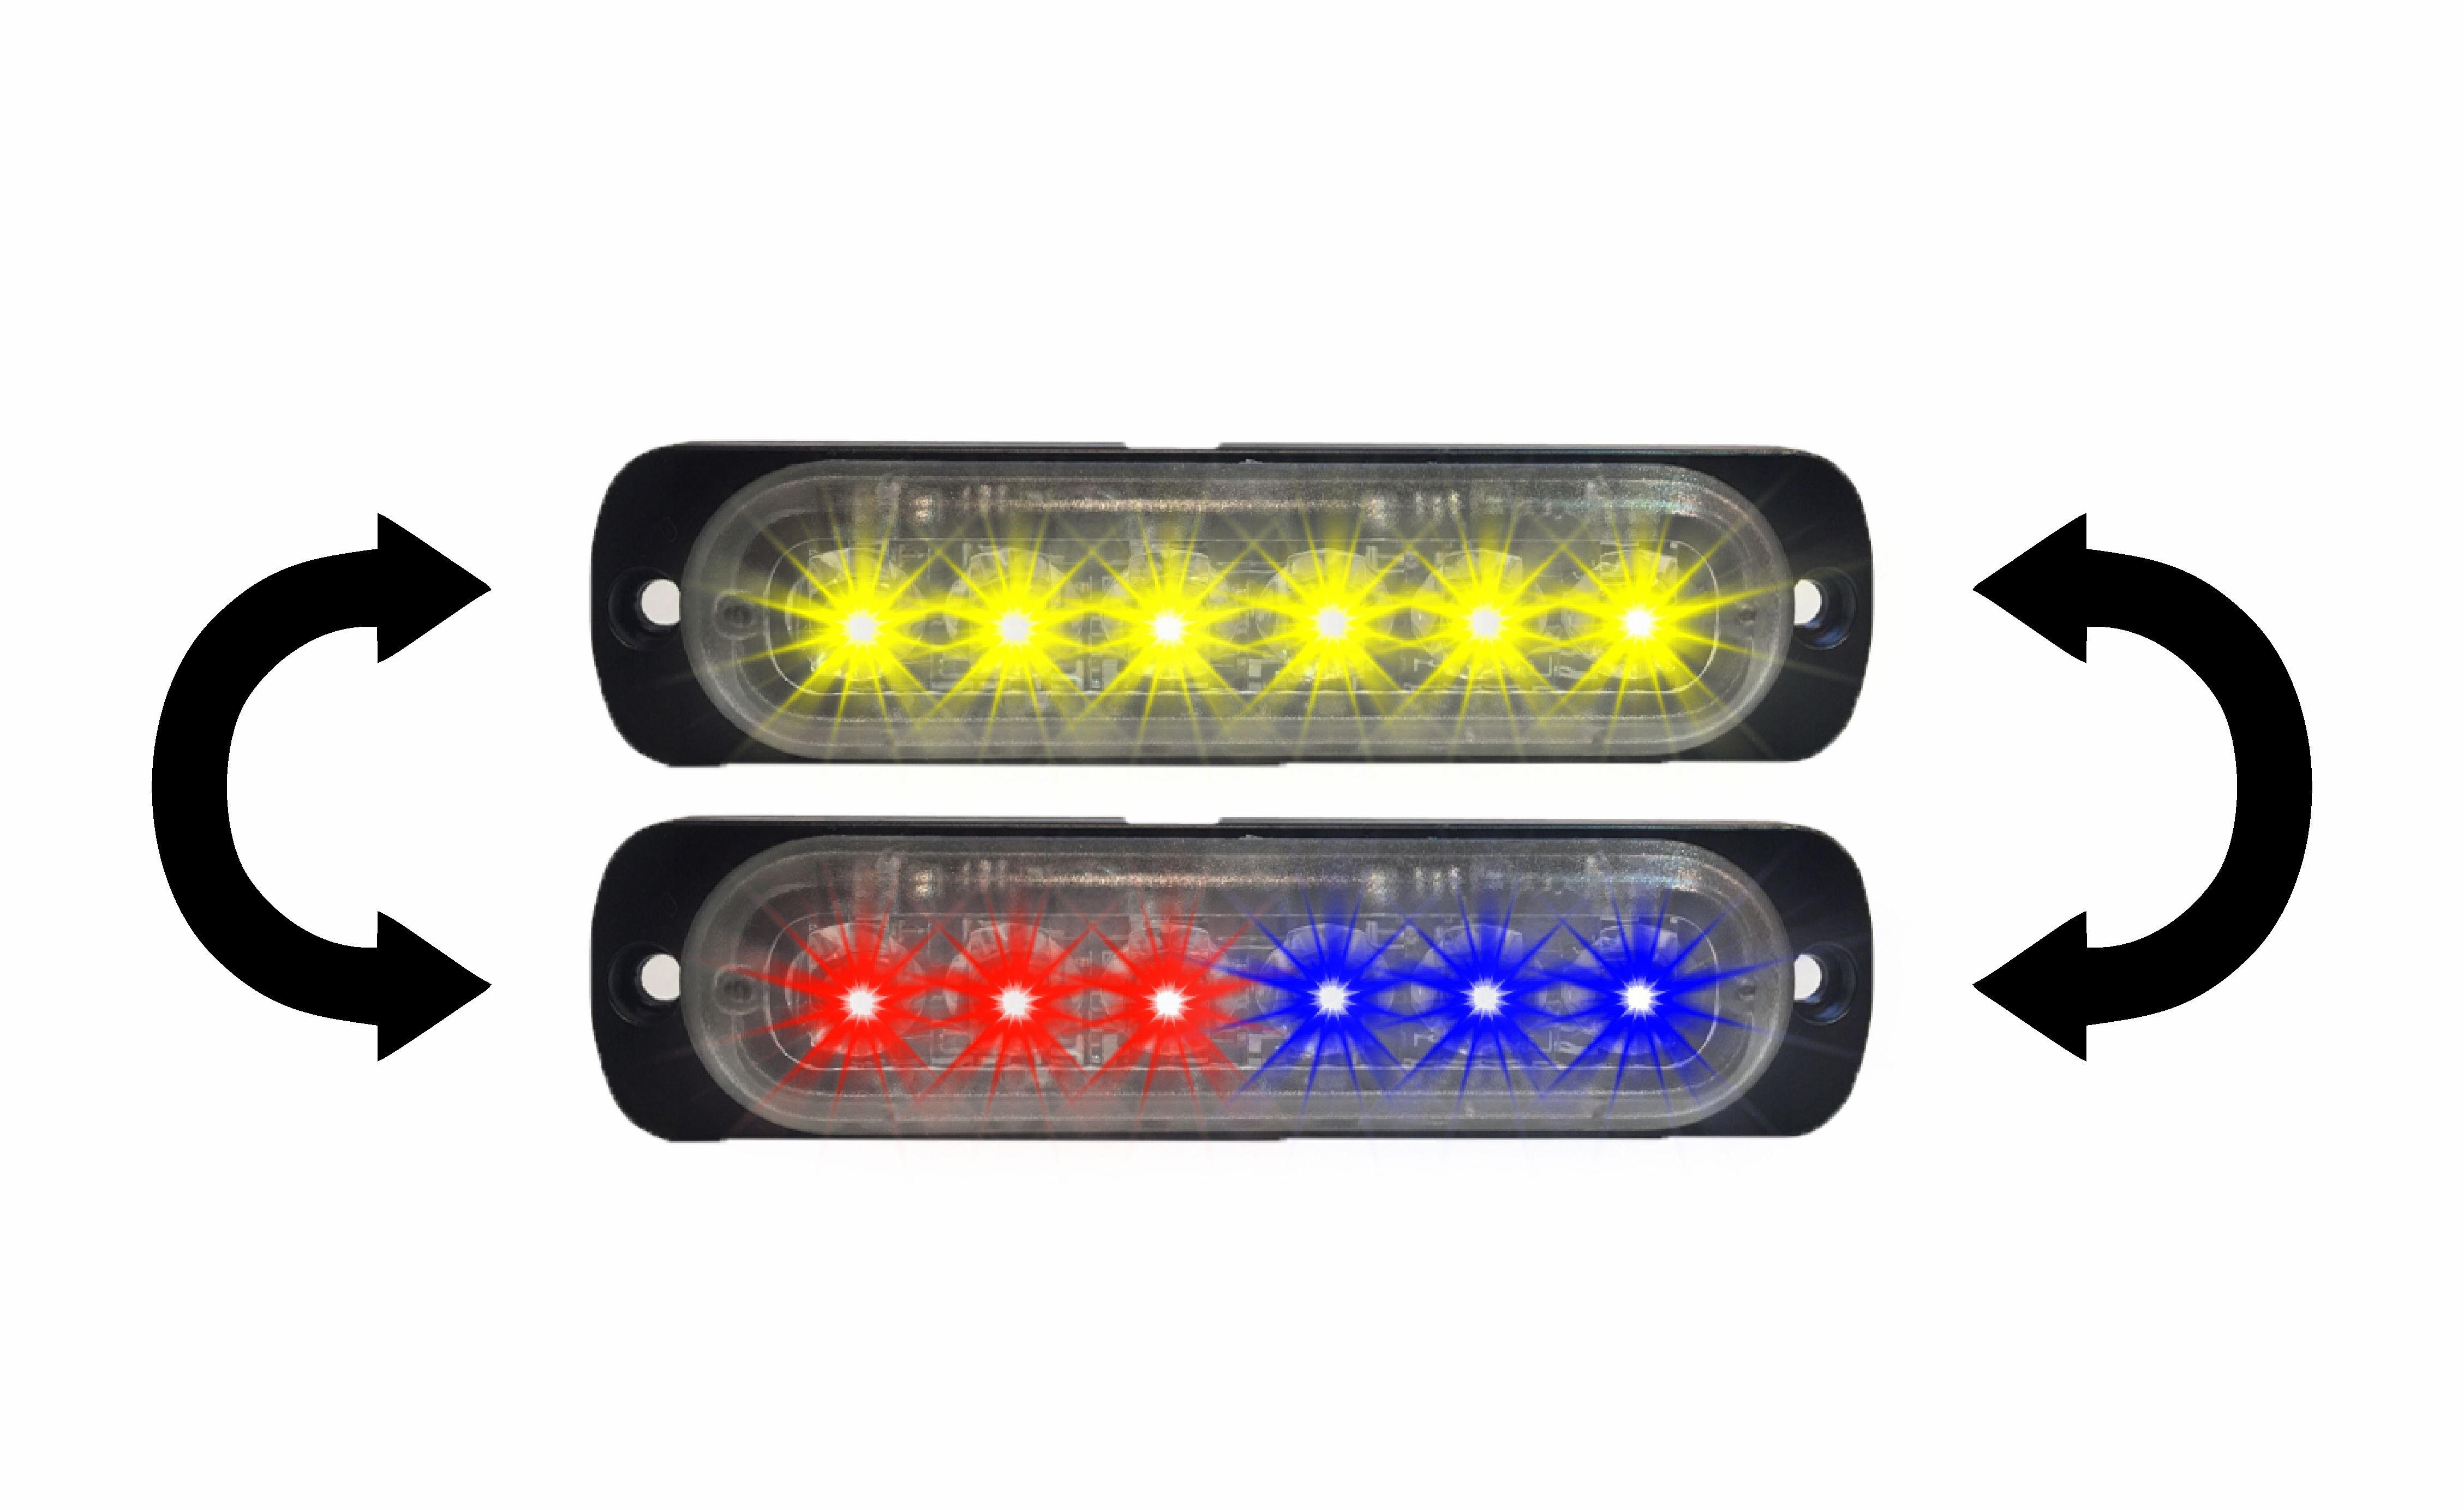 Surface Mount Led Lights Grille Outfitters Emergency Lighting 6 Best Images Of Wiring Damega Dual Color Chameleon Flex Light